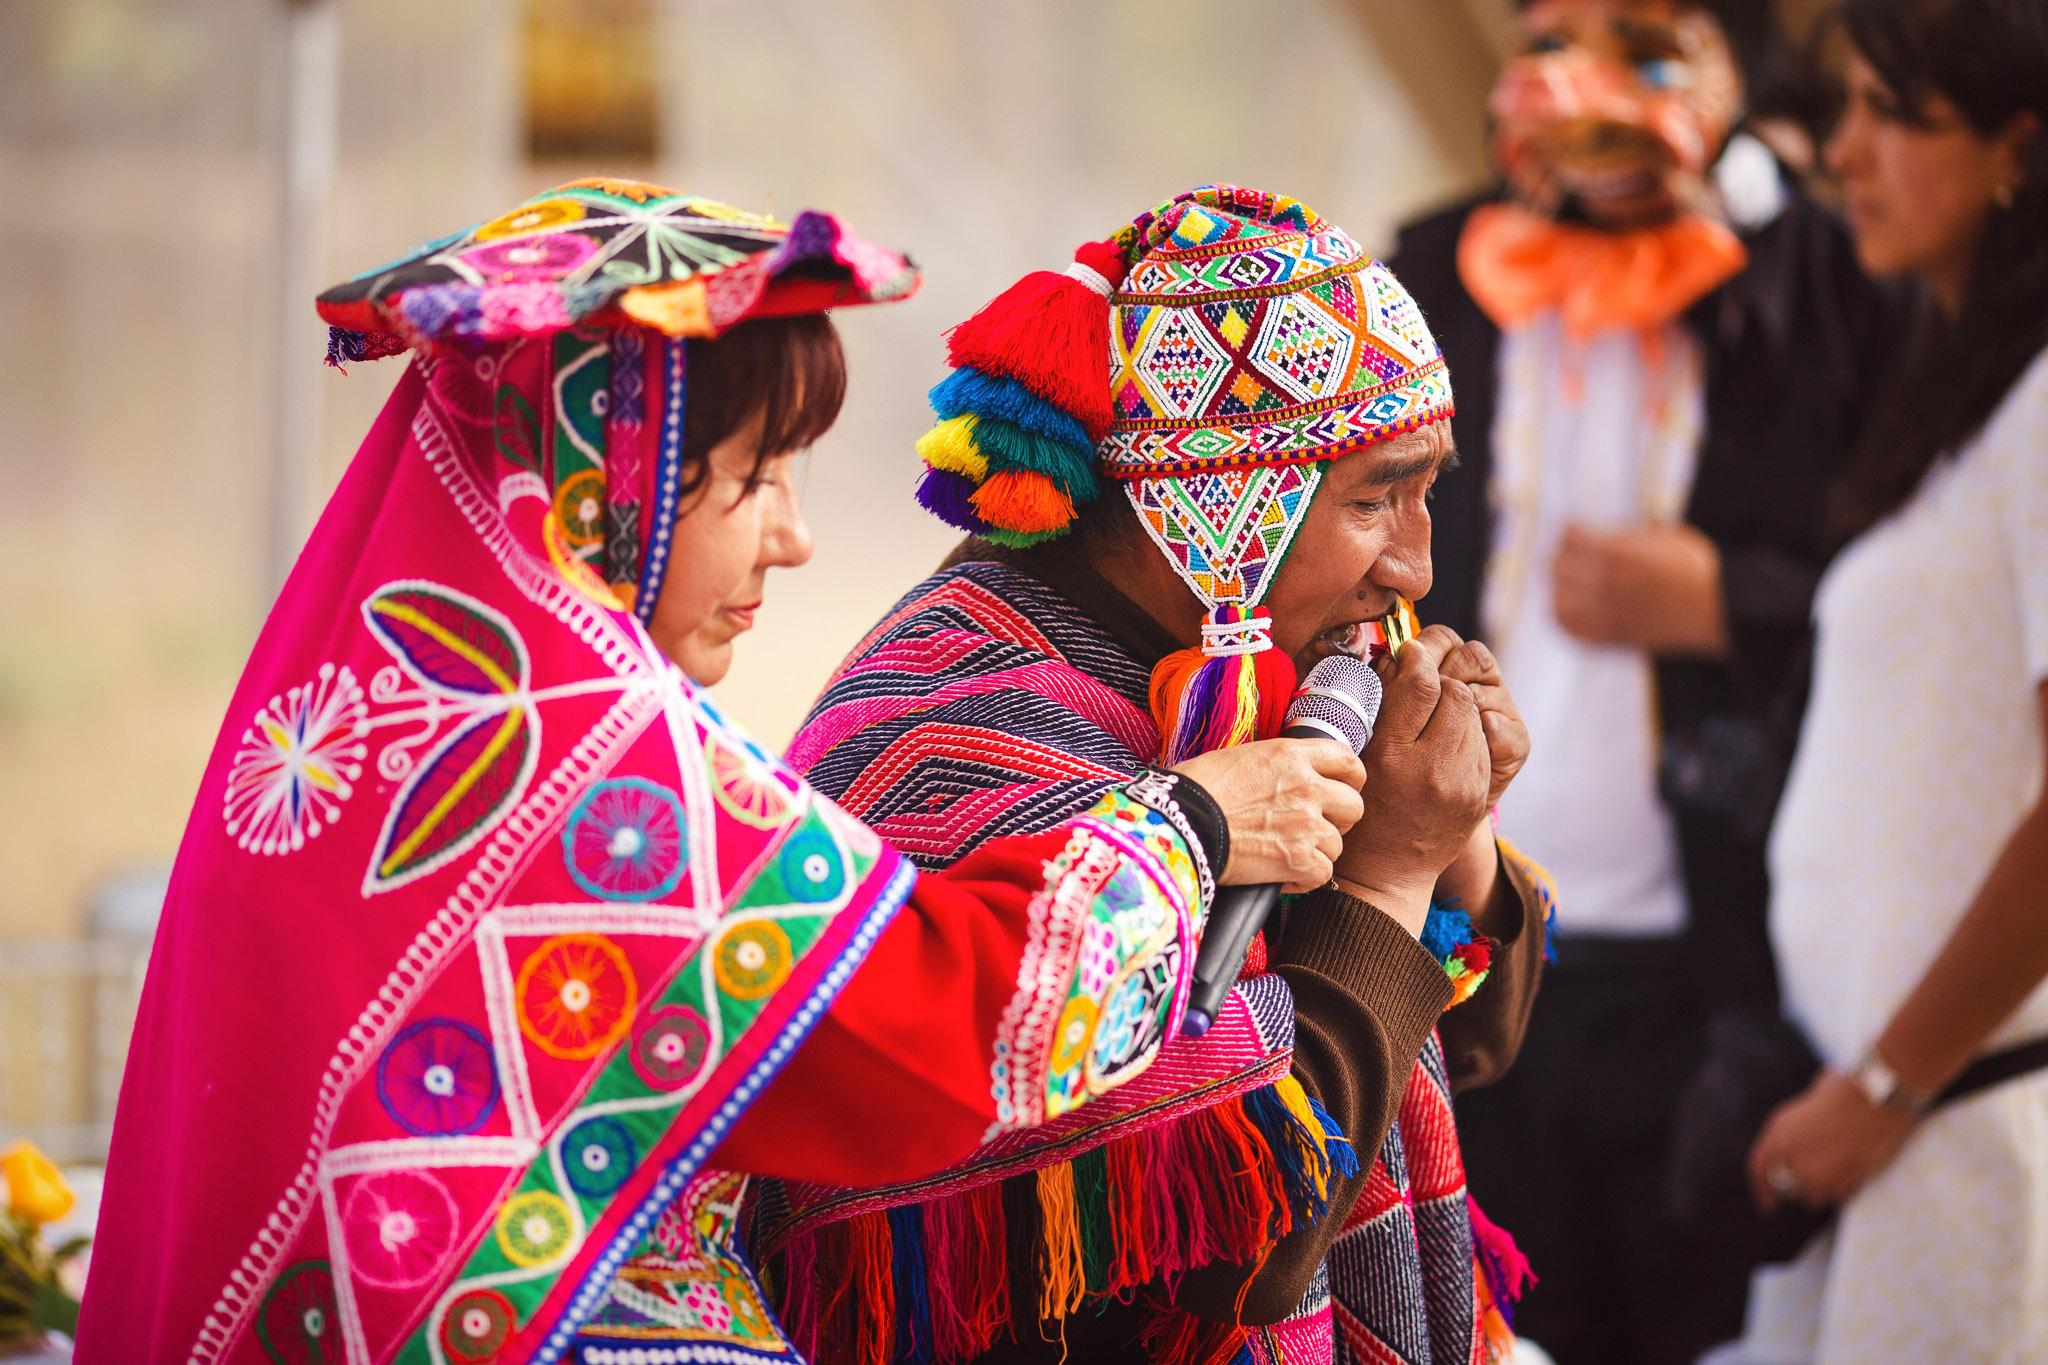 Wedding-Travellers-Destination-Wedding-Peru-Cusco-Hacienda-Sarapampa-Sacred-Valley-traditional-andean-ceremony-koka-kintu-three-coca-leafs-shamrock